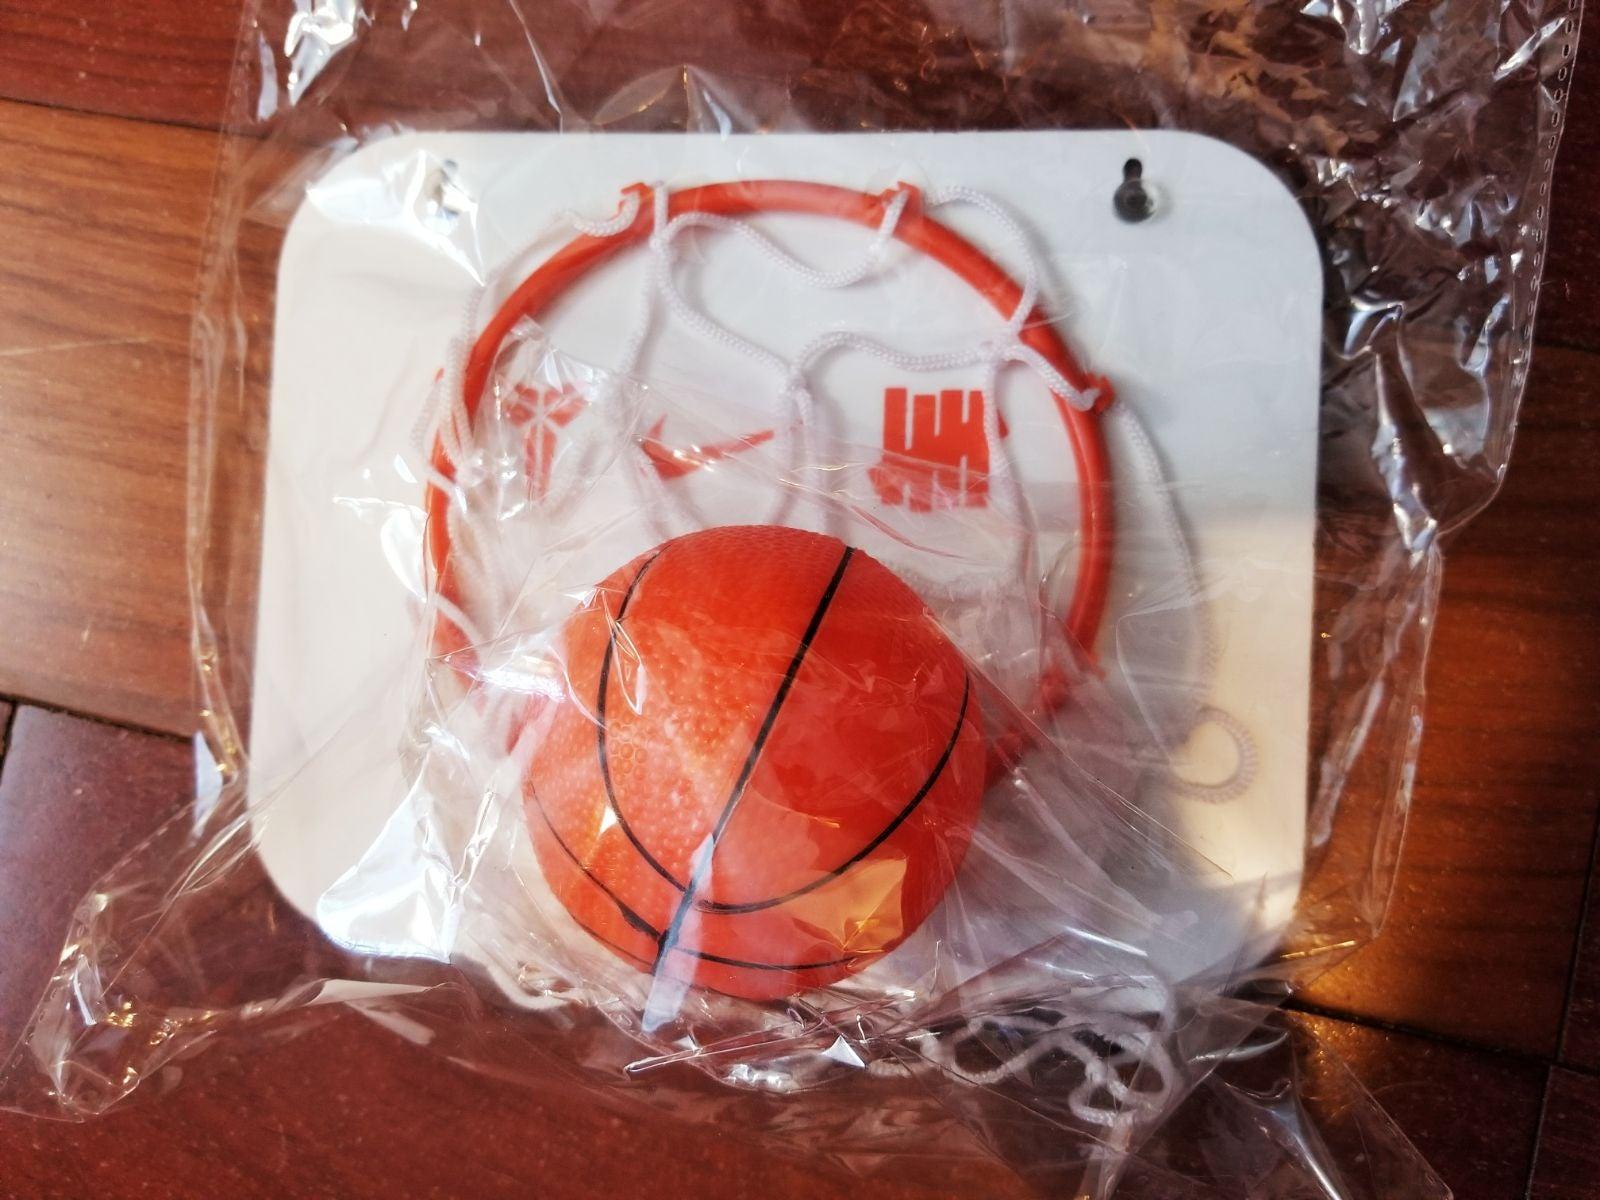 UNDEFEATED Nike Kobe Basketball Hoop